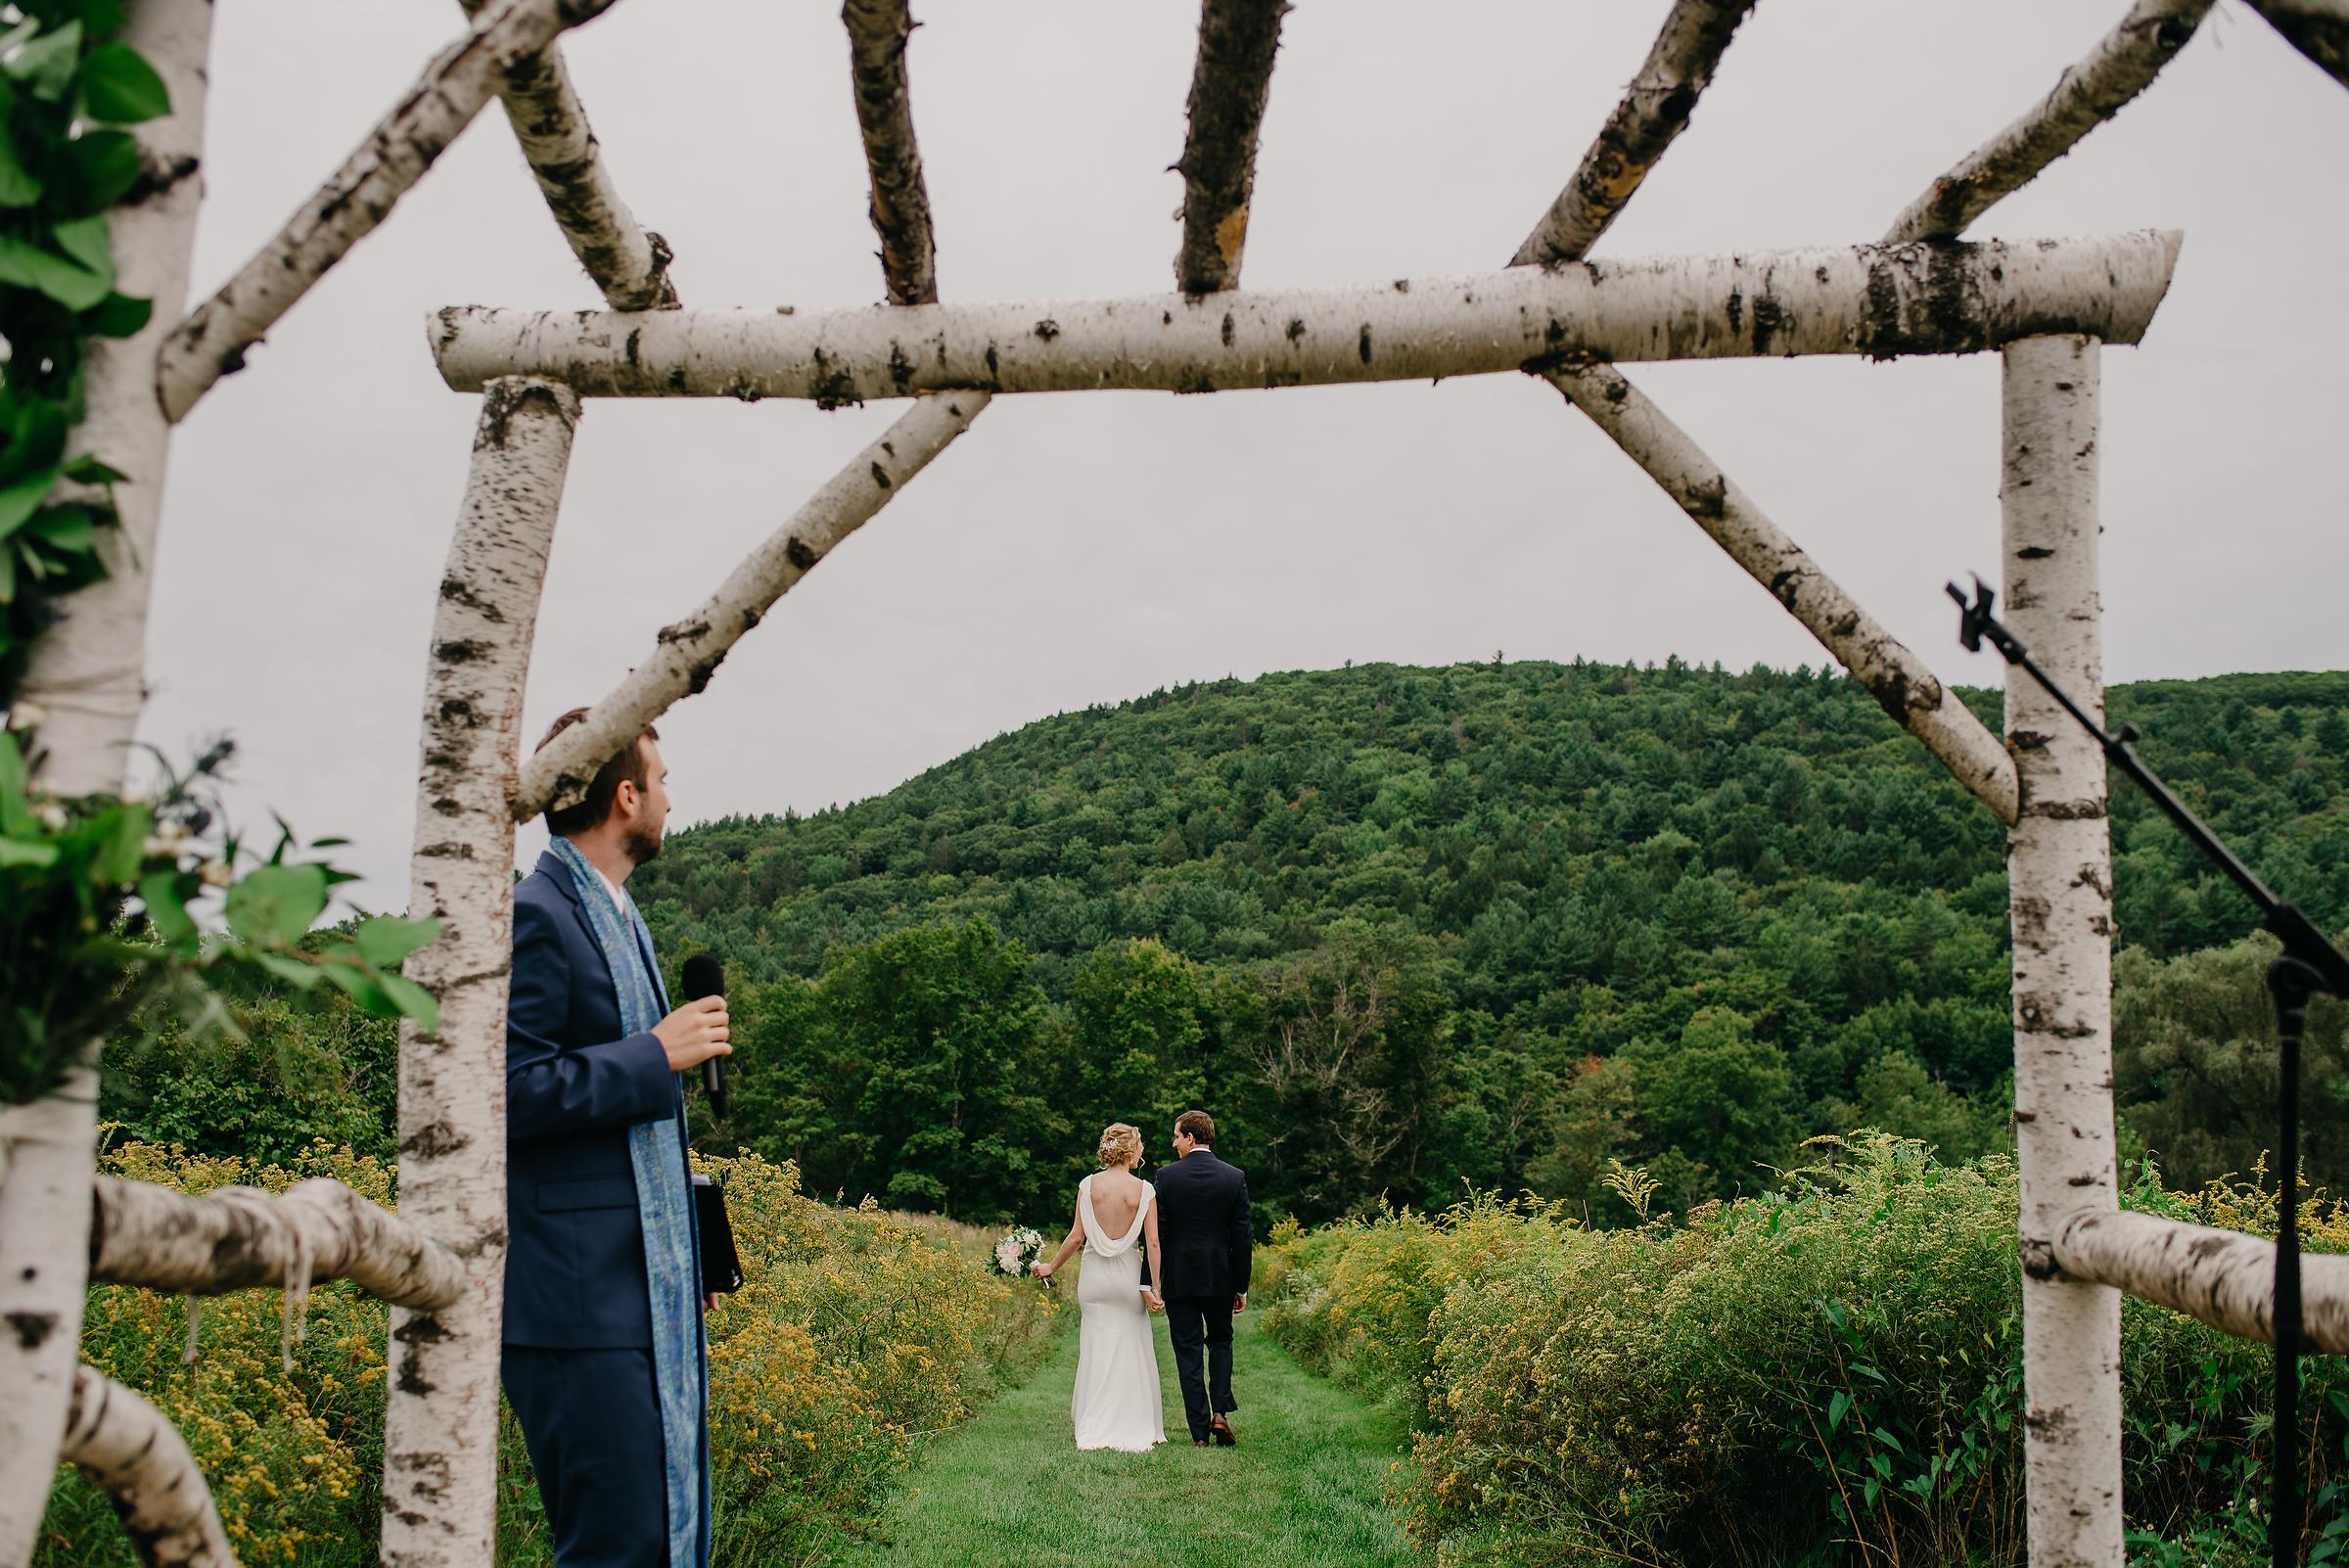 Montague Retreat Center wedding outdoor ceremony in september